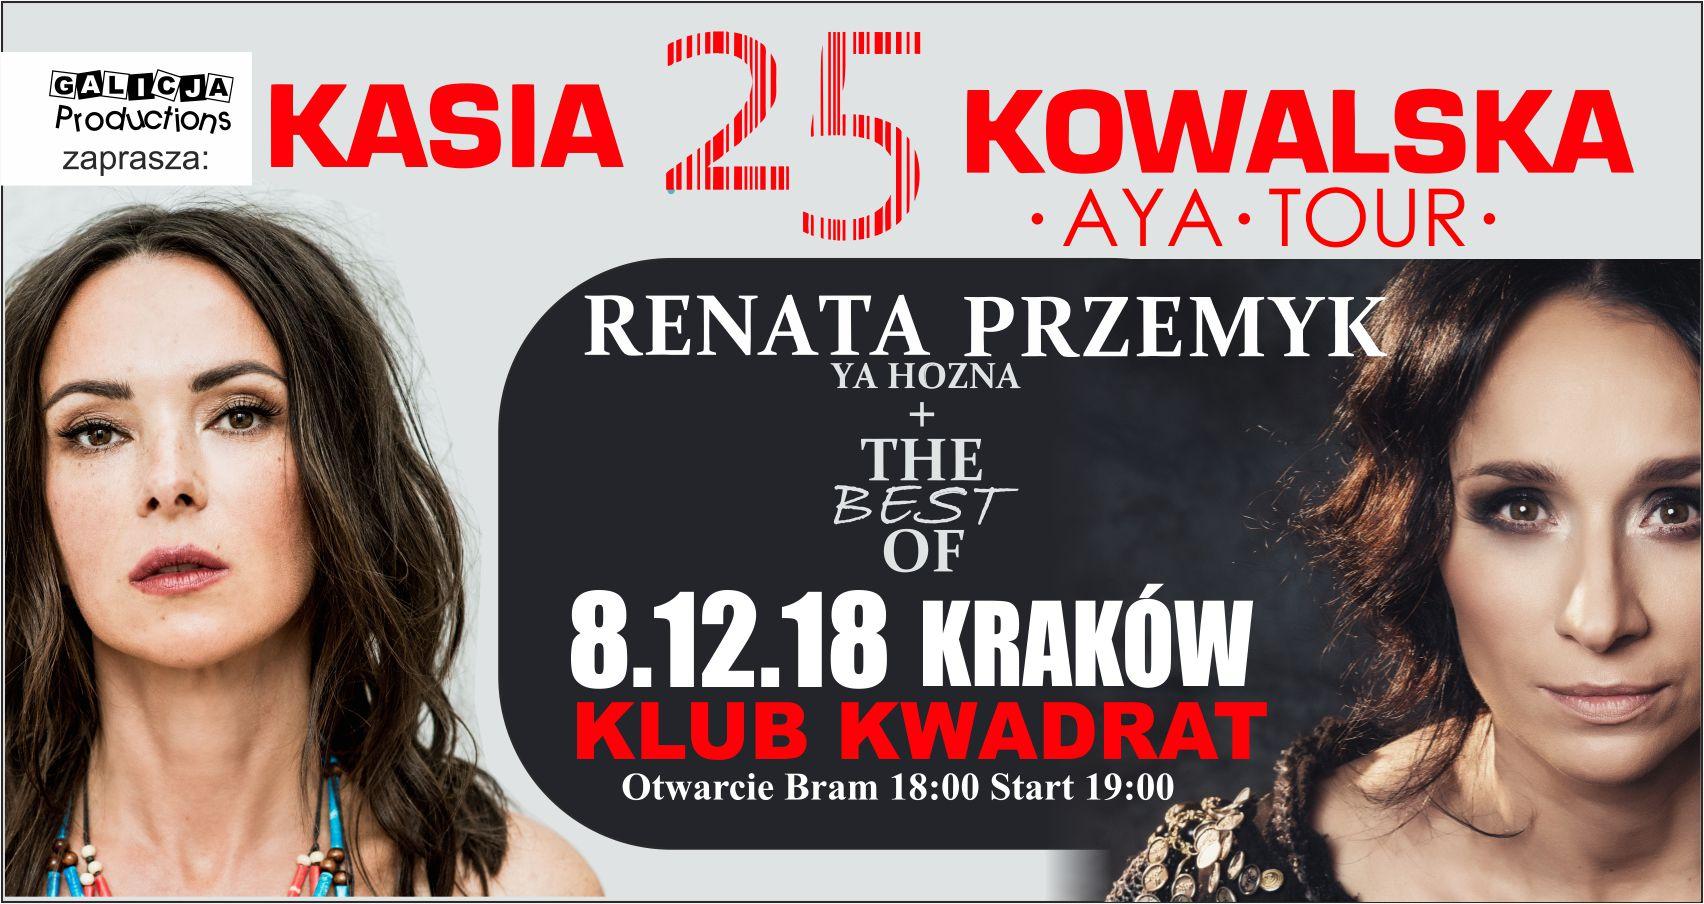 Kasia Kowalska | Renata Przemyk - SOLD OUT!